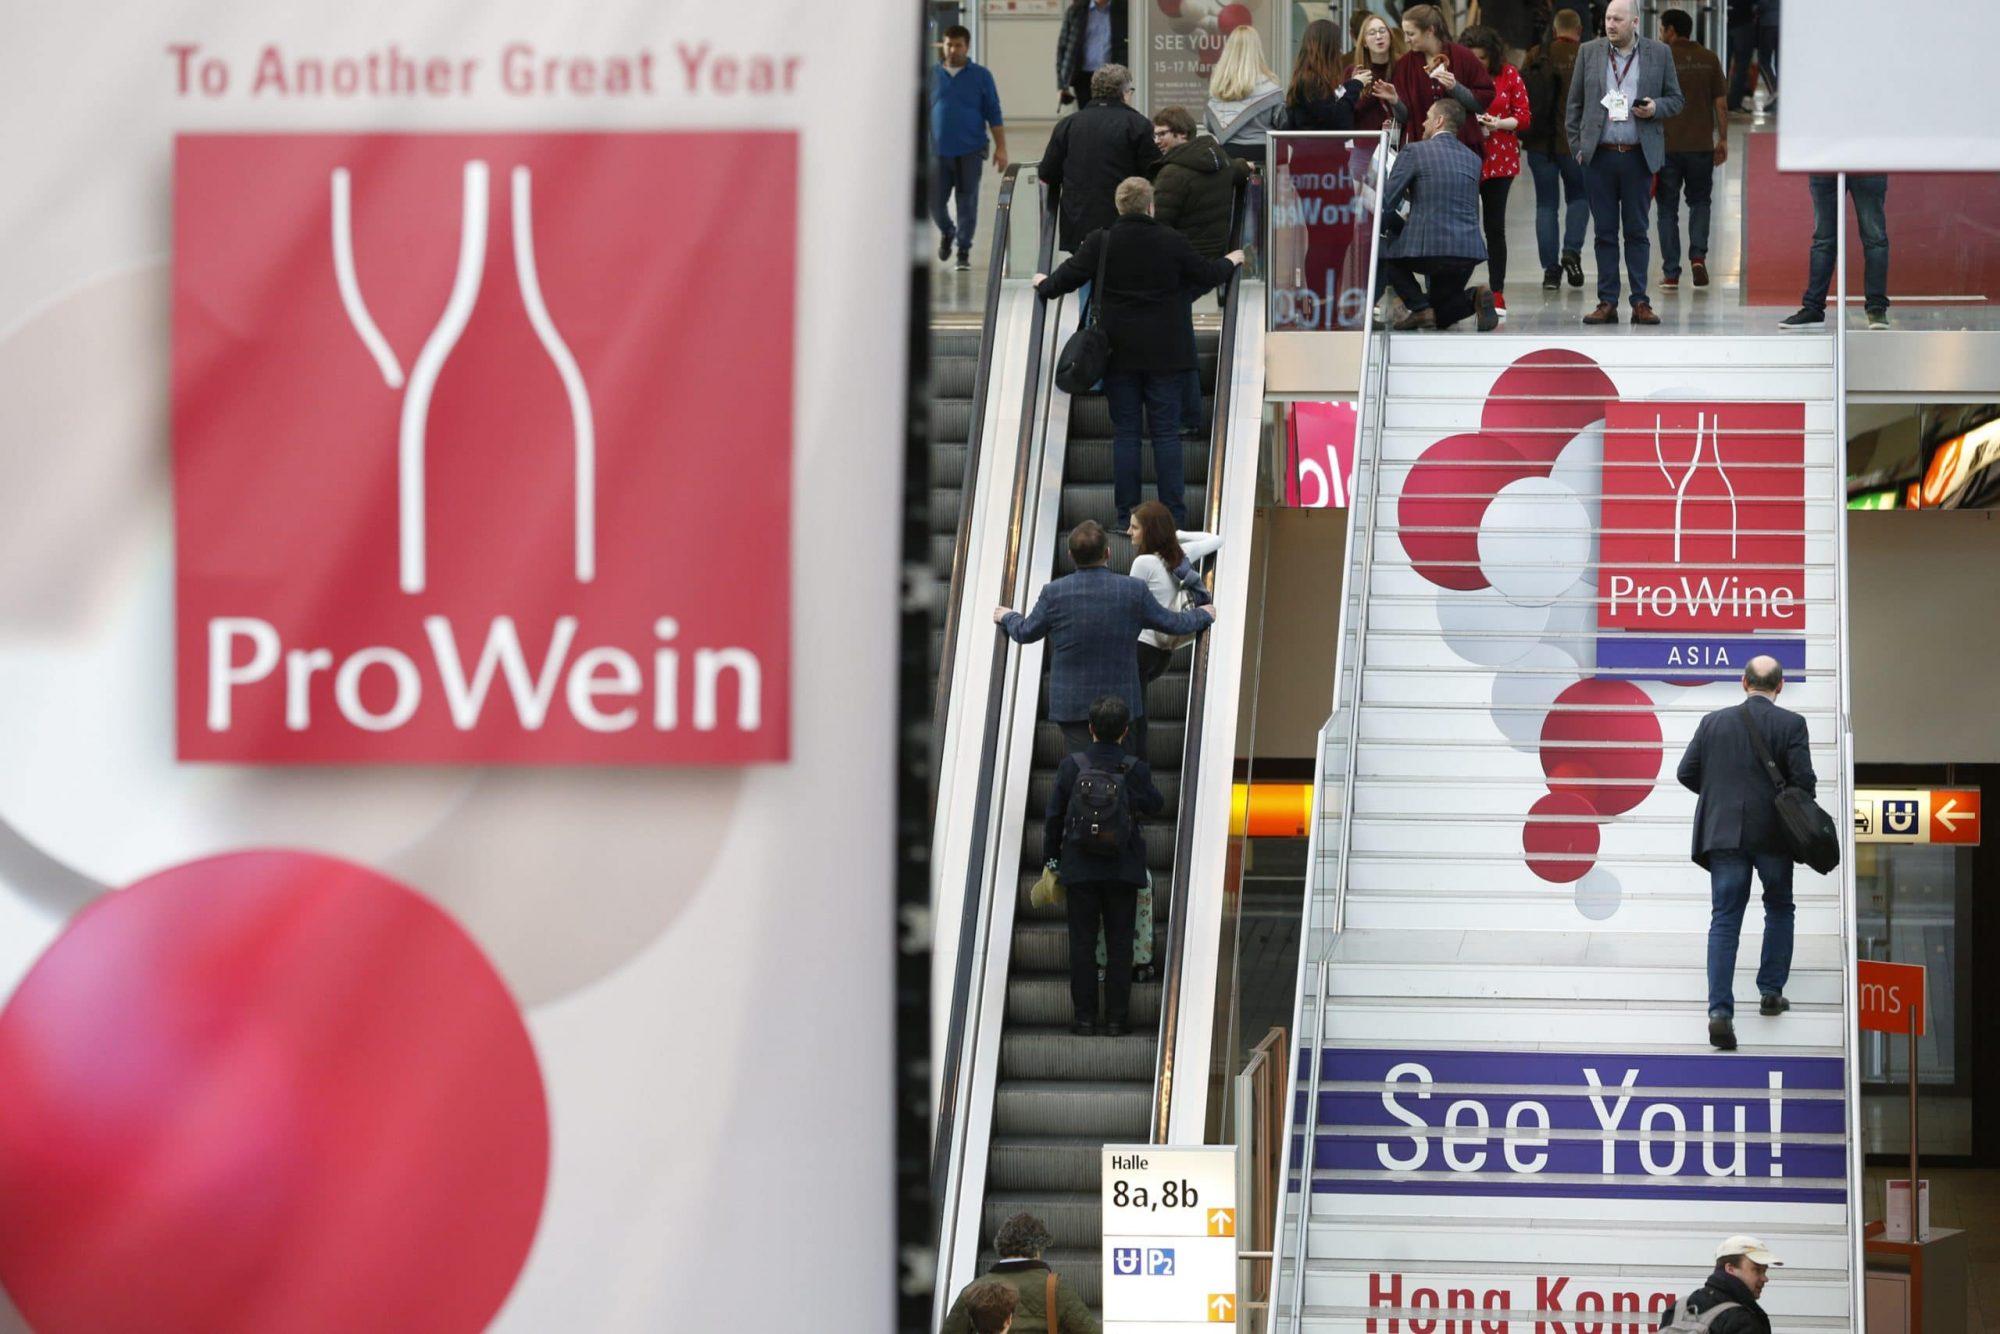 Prowein 2019. Crédit photo : Messe Düsseldorf/ctillmann